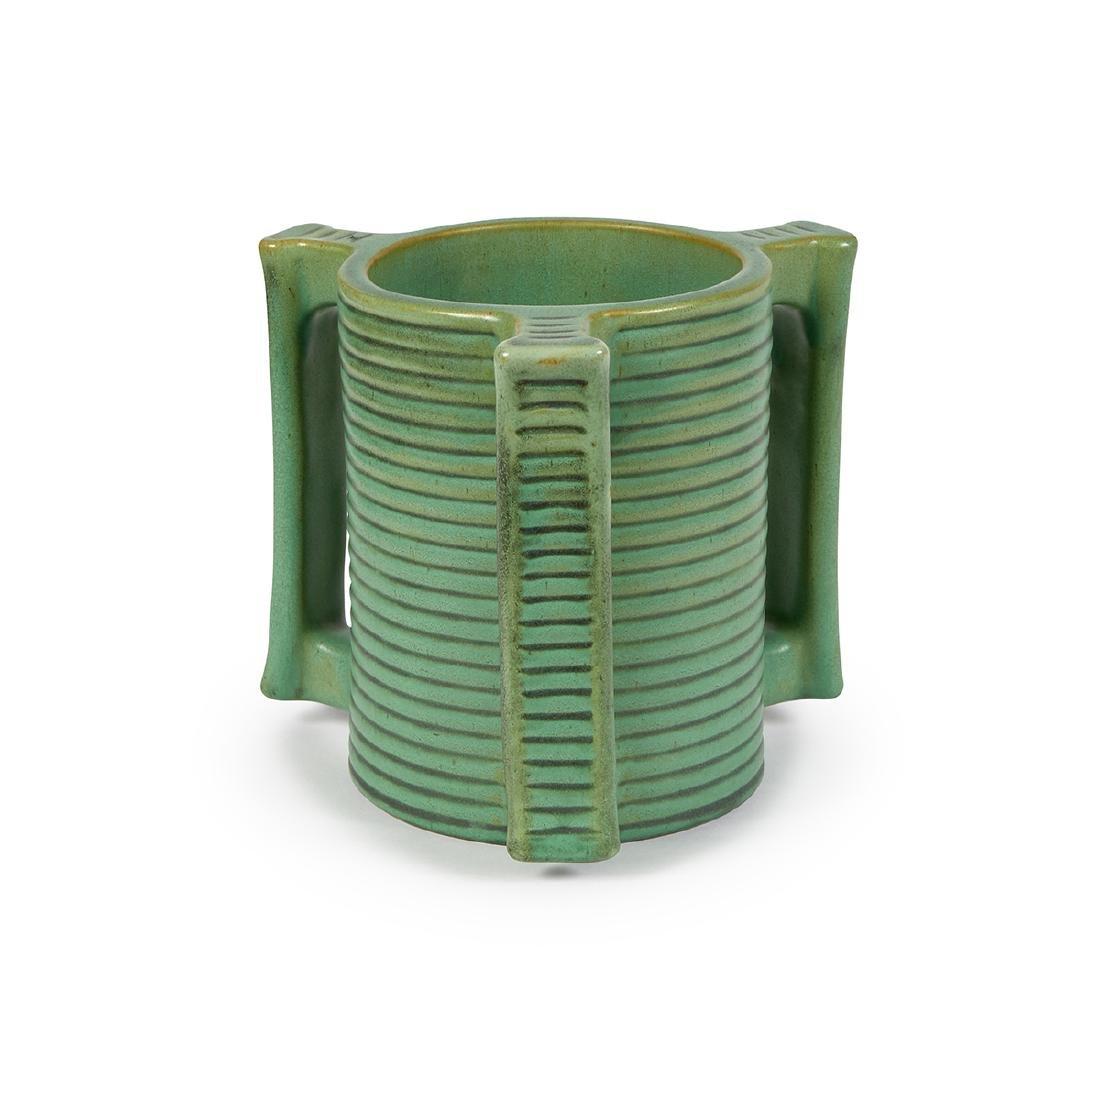 Teco, W.D. Gates, Three-Handled Vase, #278 - 2